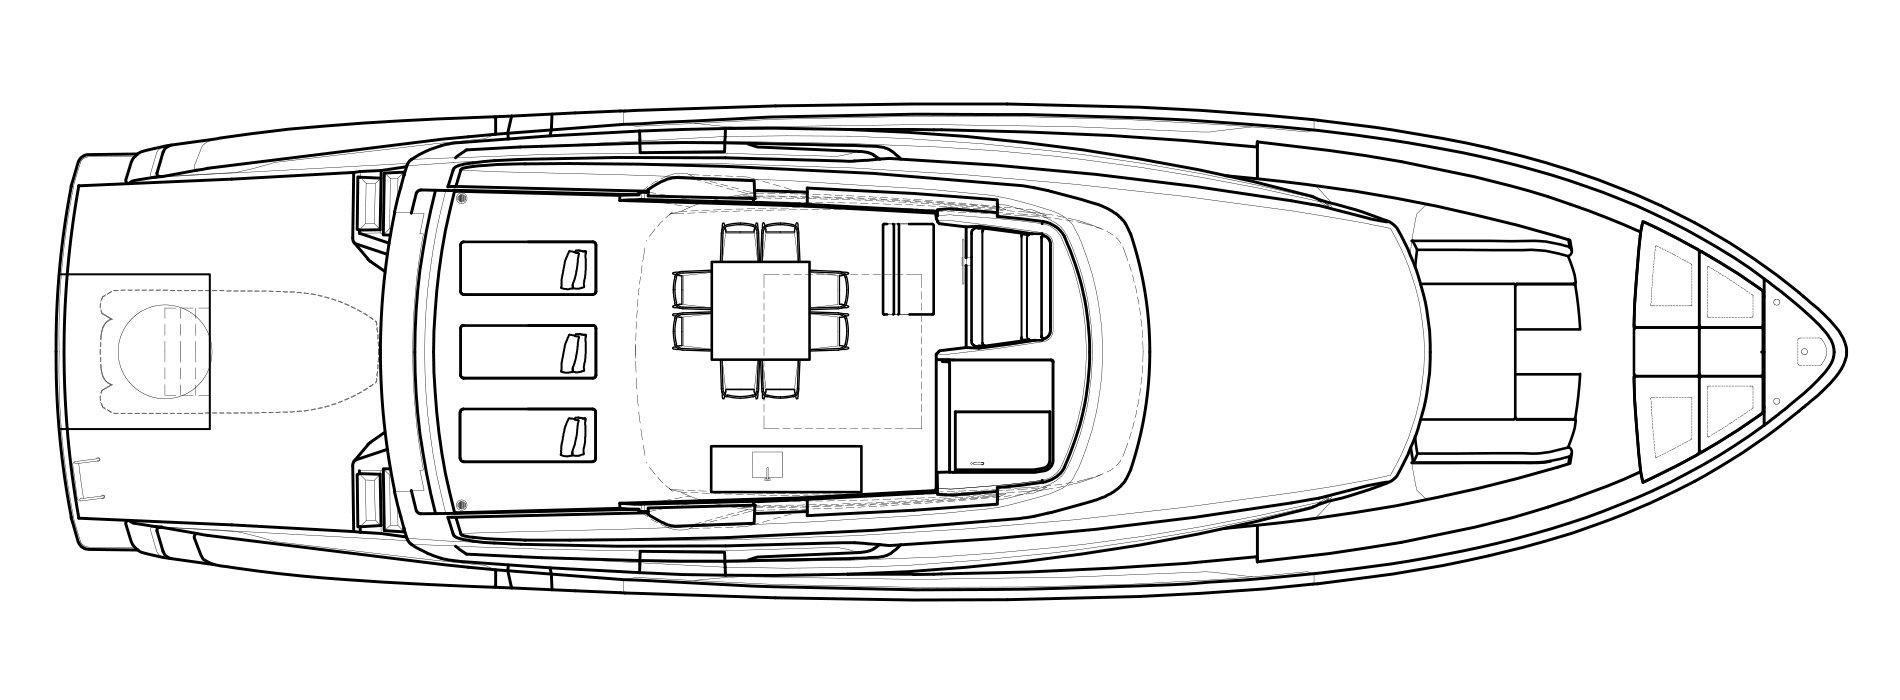 Sanlorenzo Yachts SX76 Flying bridge Versione A